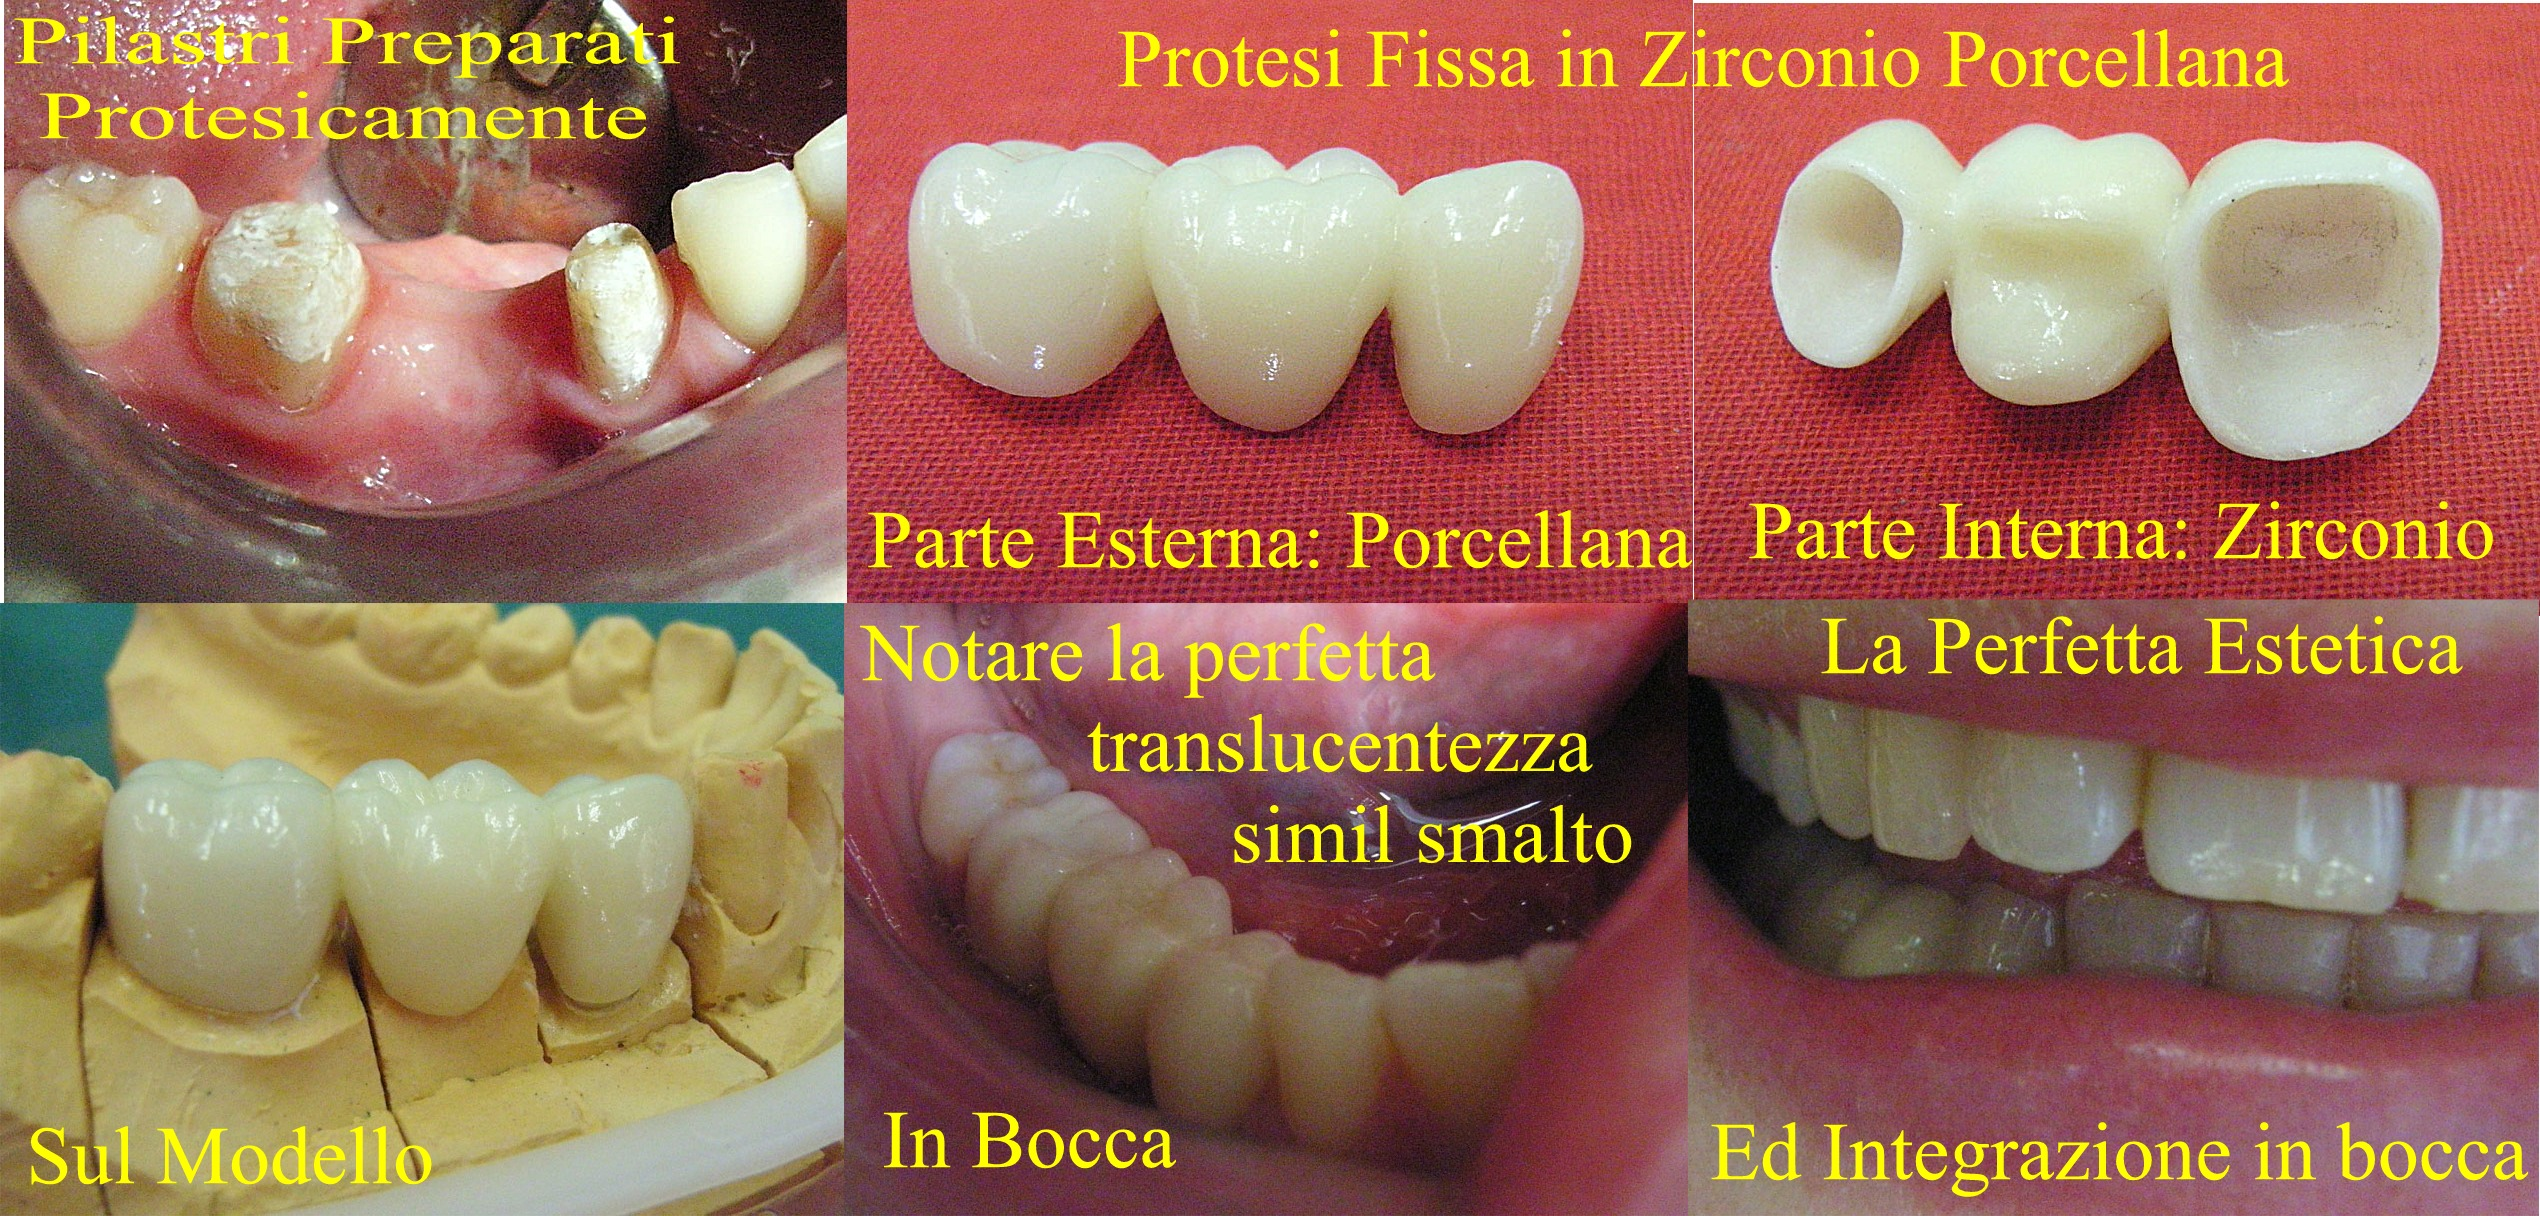 francesca090112.jpg